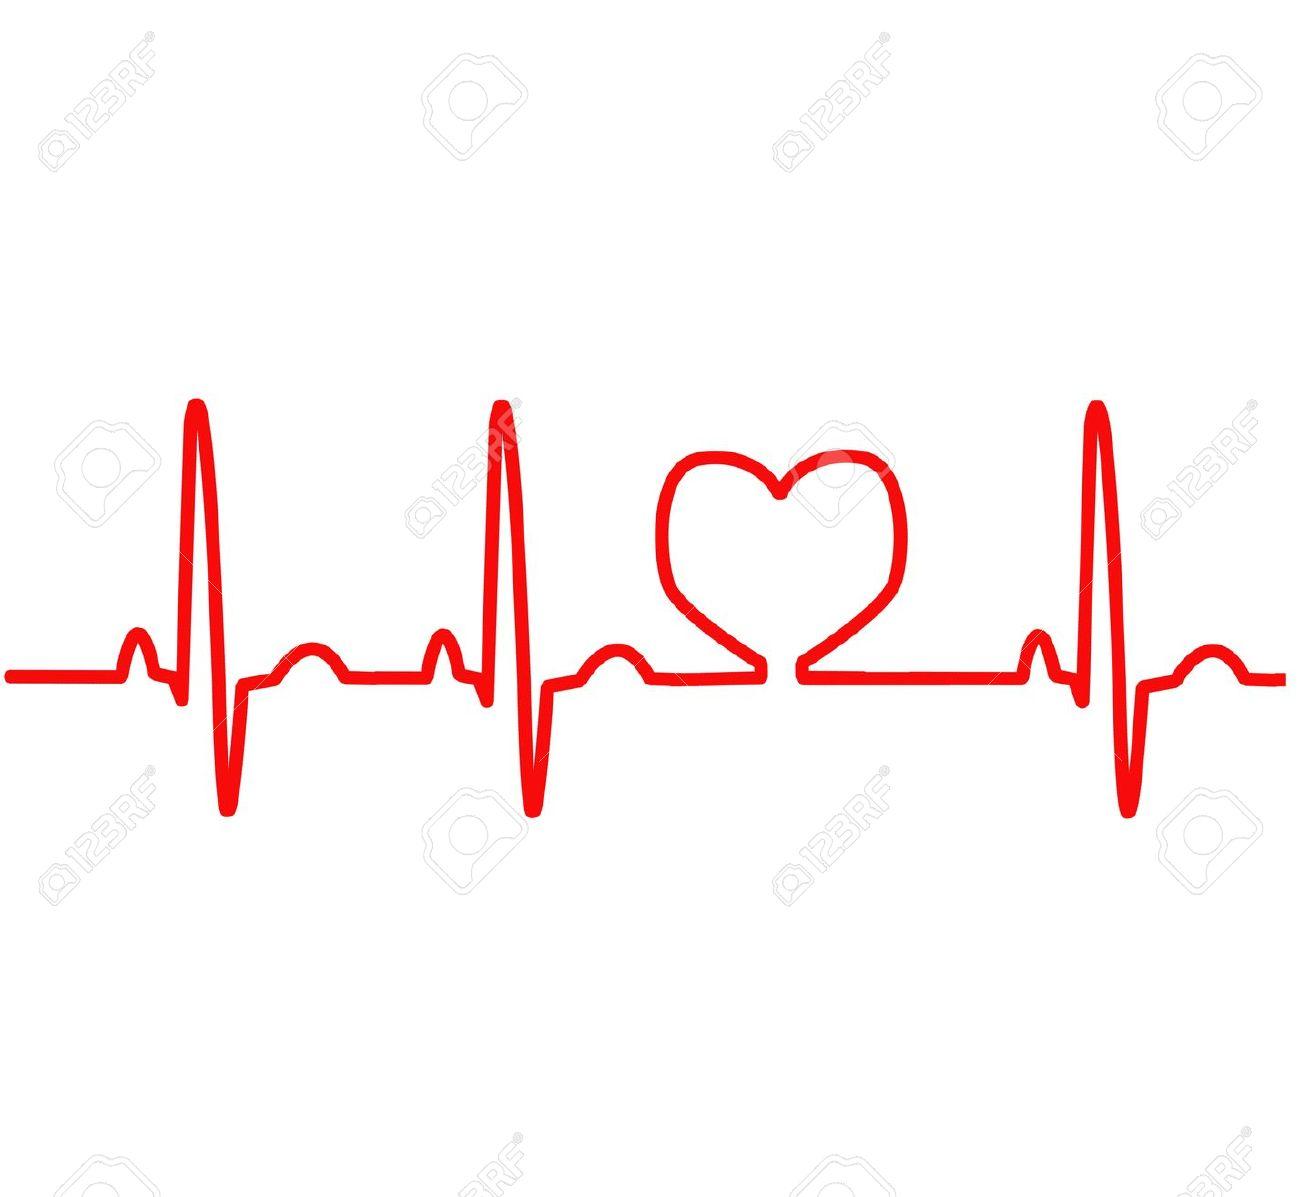 Red Heart Ekg Clipart #1-Red Heart Ekg Clipart #1-5